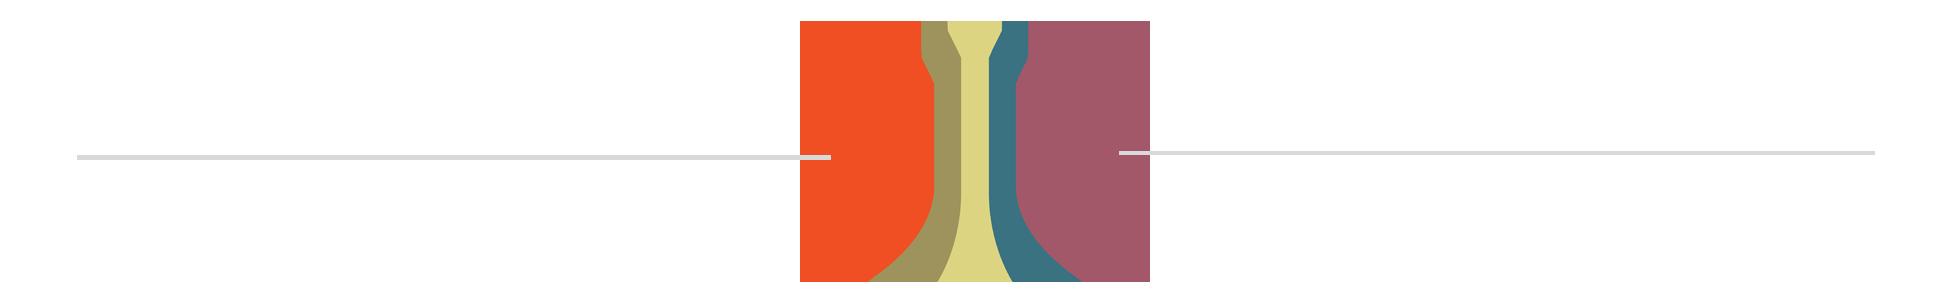 LogoDividerWithBuffer